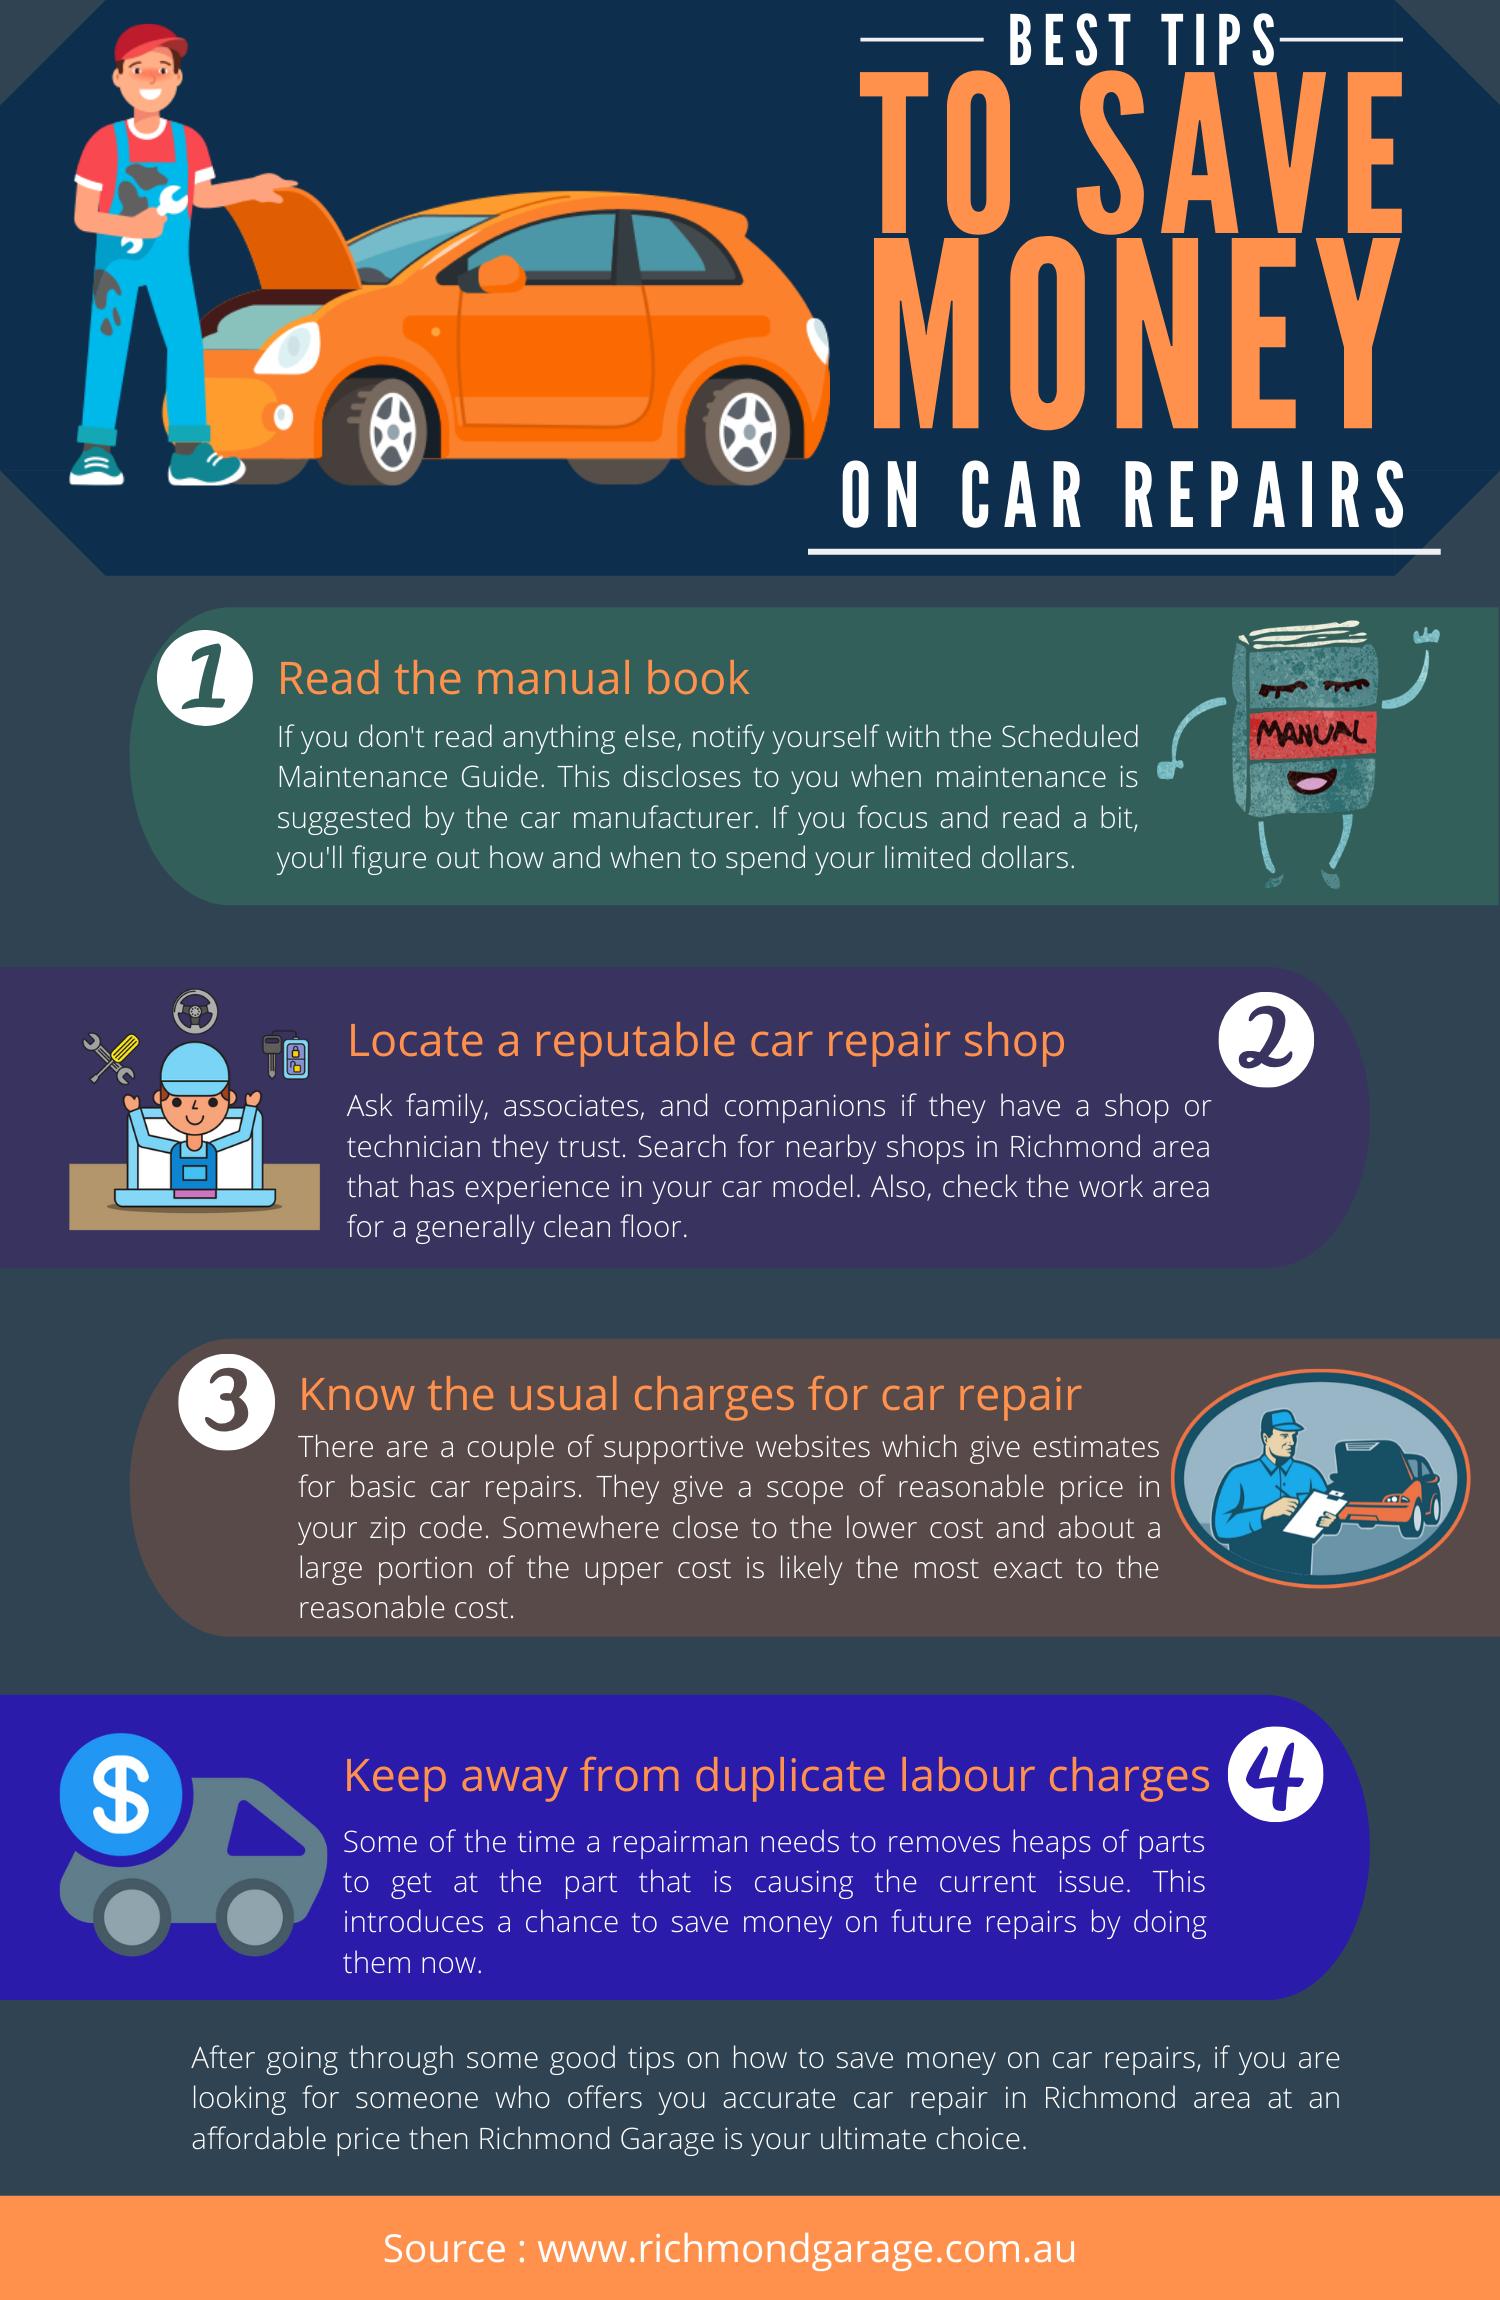 Best Tips To Save Money On Car Repairs Visual Ly Auto Repair Repair Saving Money